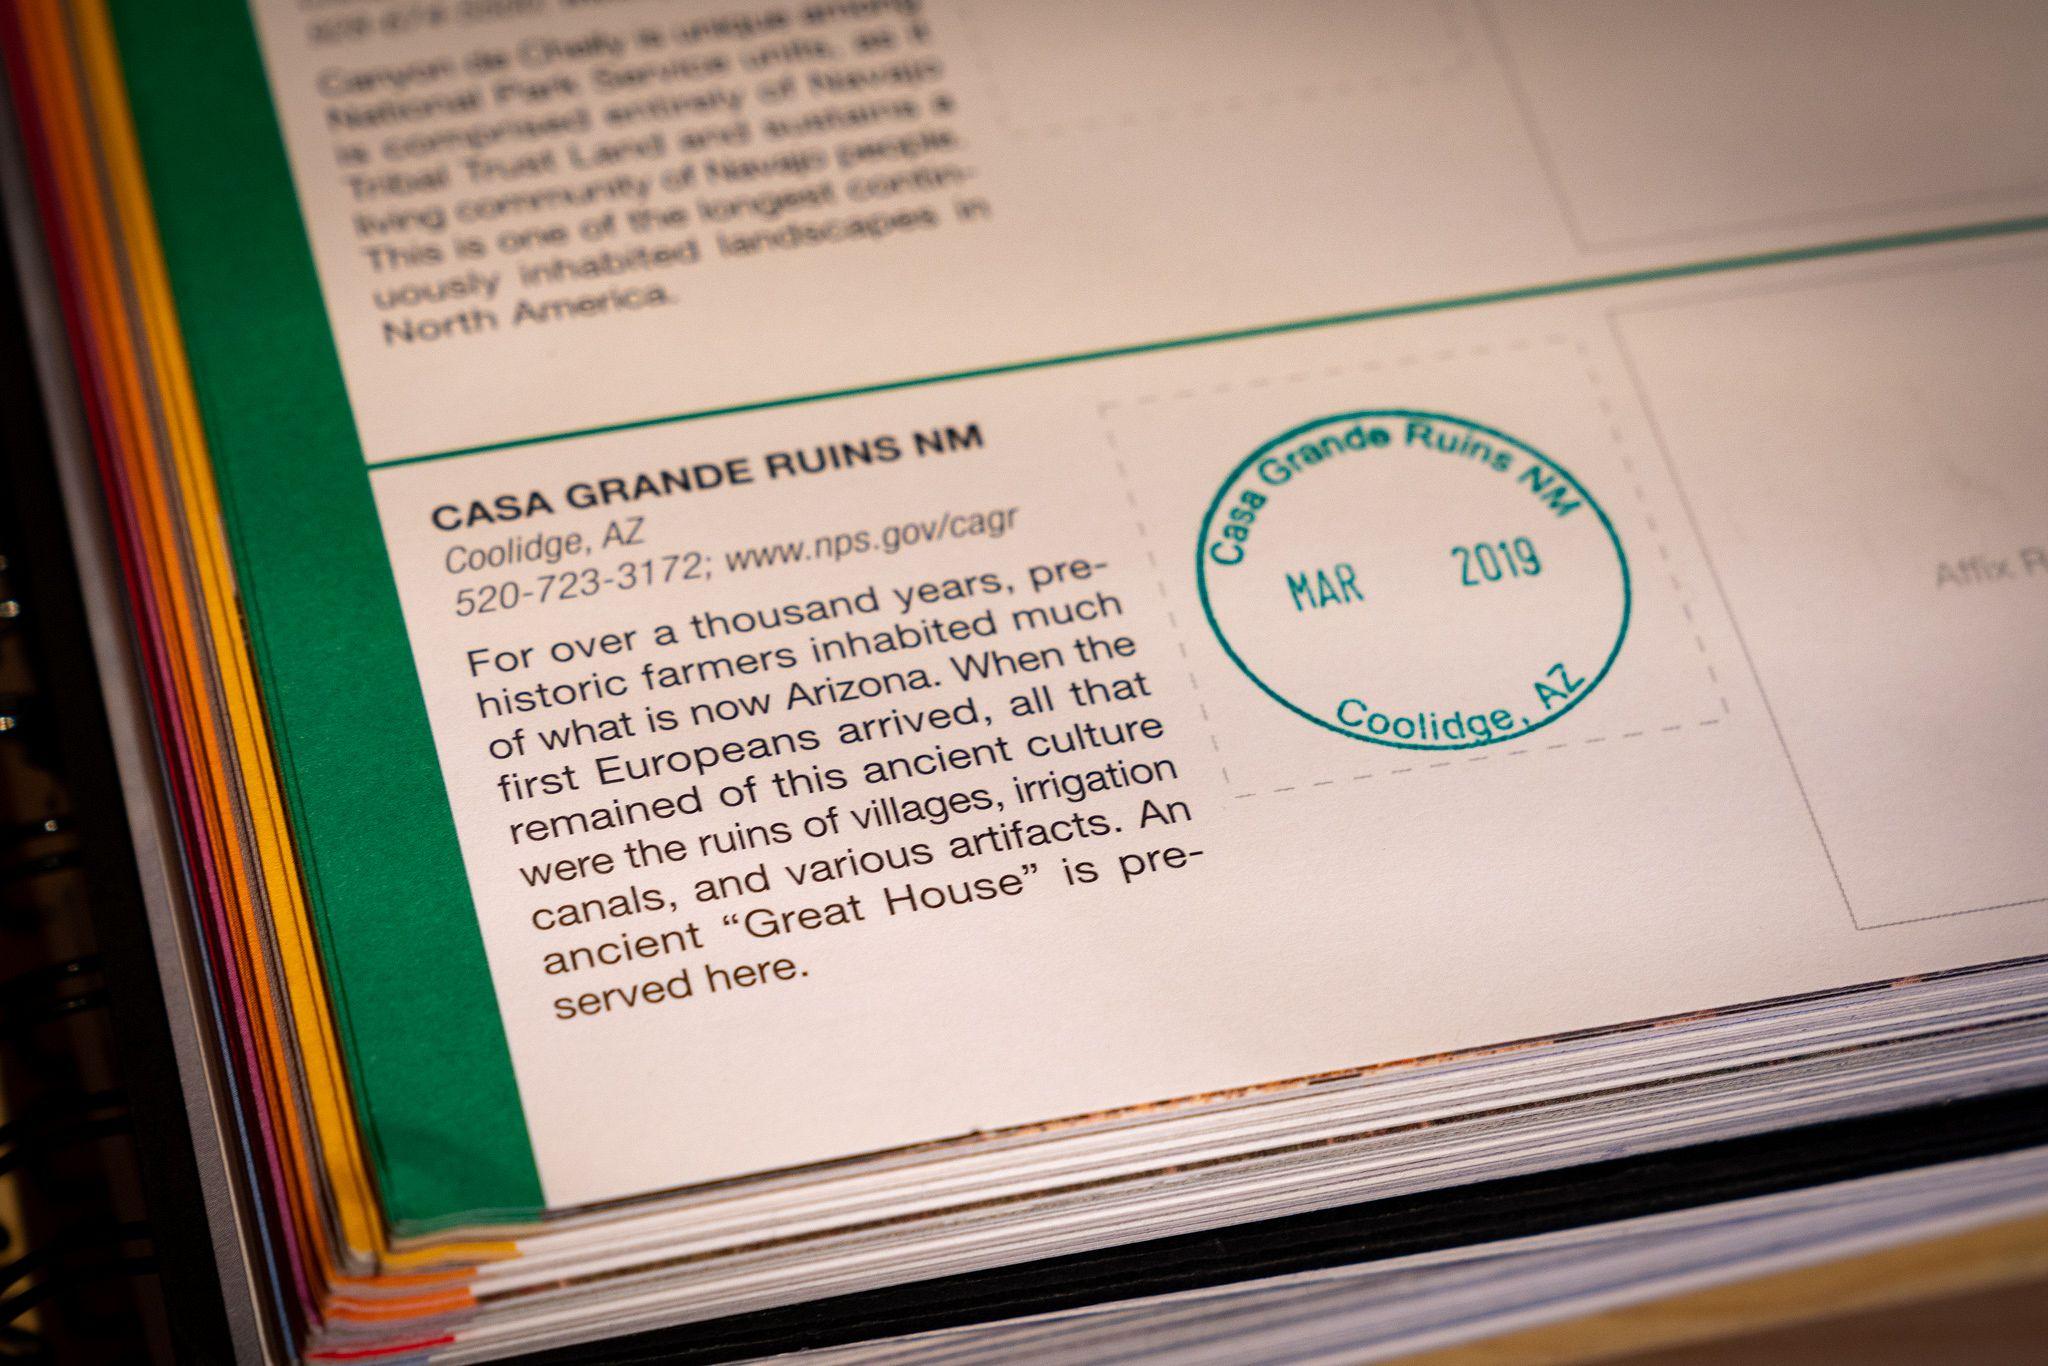 Passport Stamp at Casa Grande Ruins National Monument